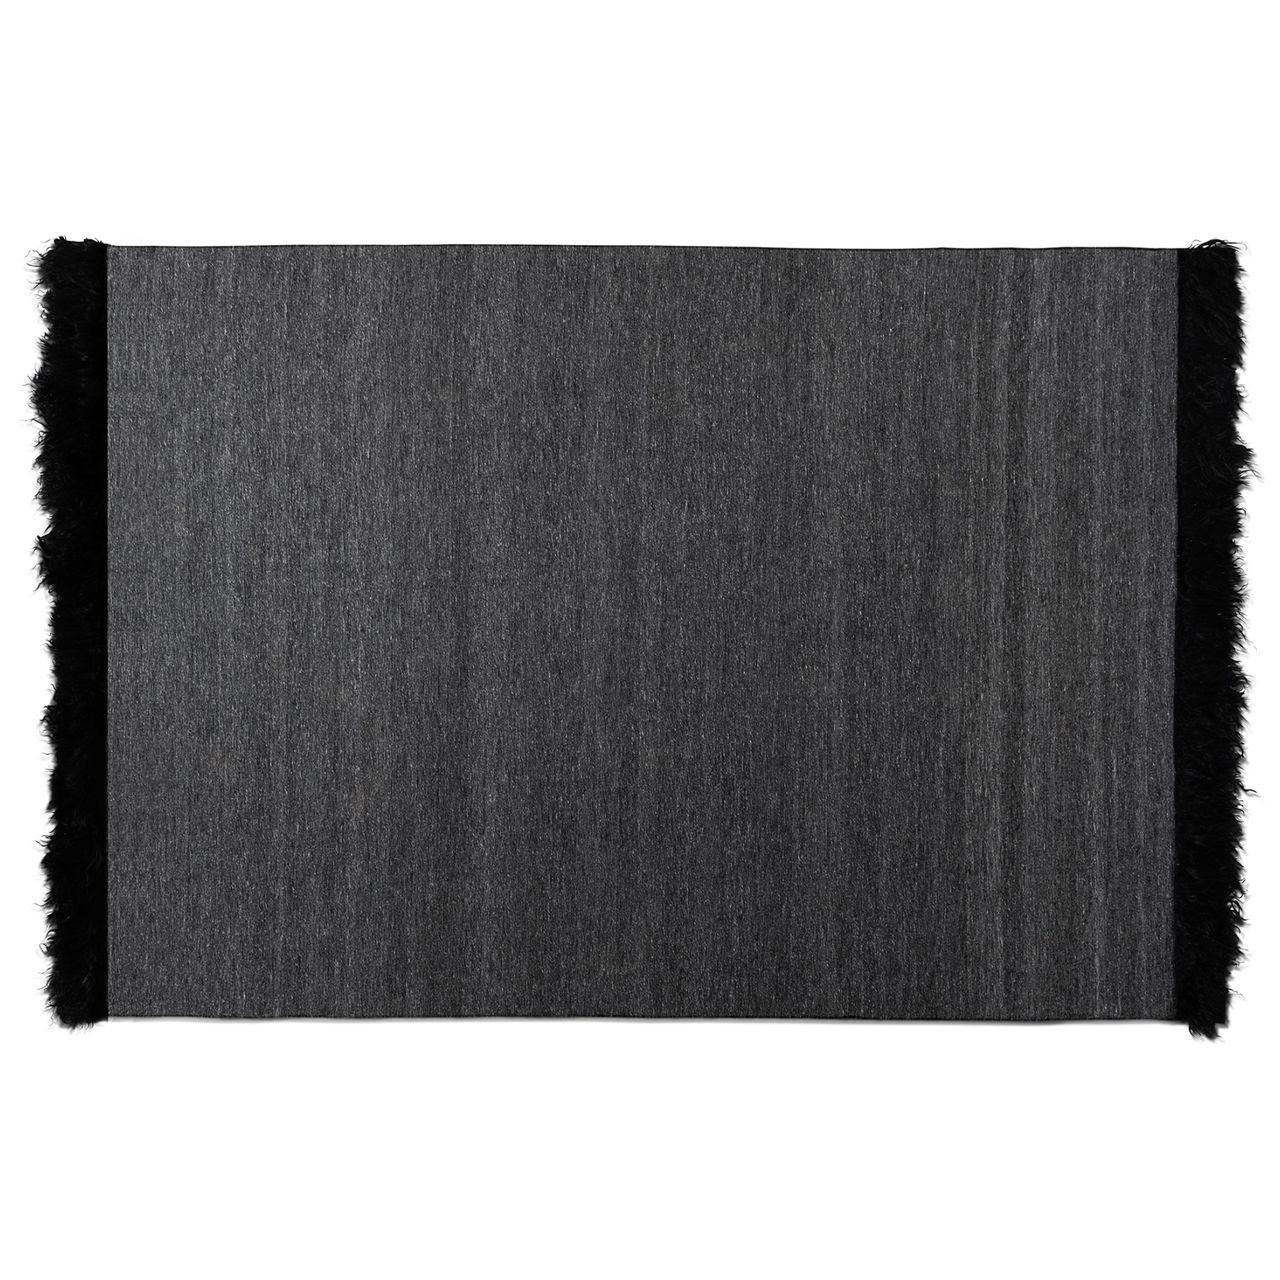 Baxton Studio Dalston Dark Grey/Black Handwoven Wool Blend Area Rug